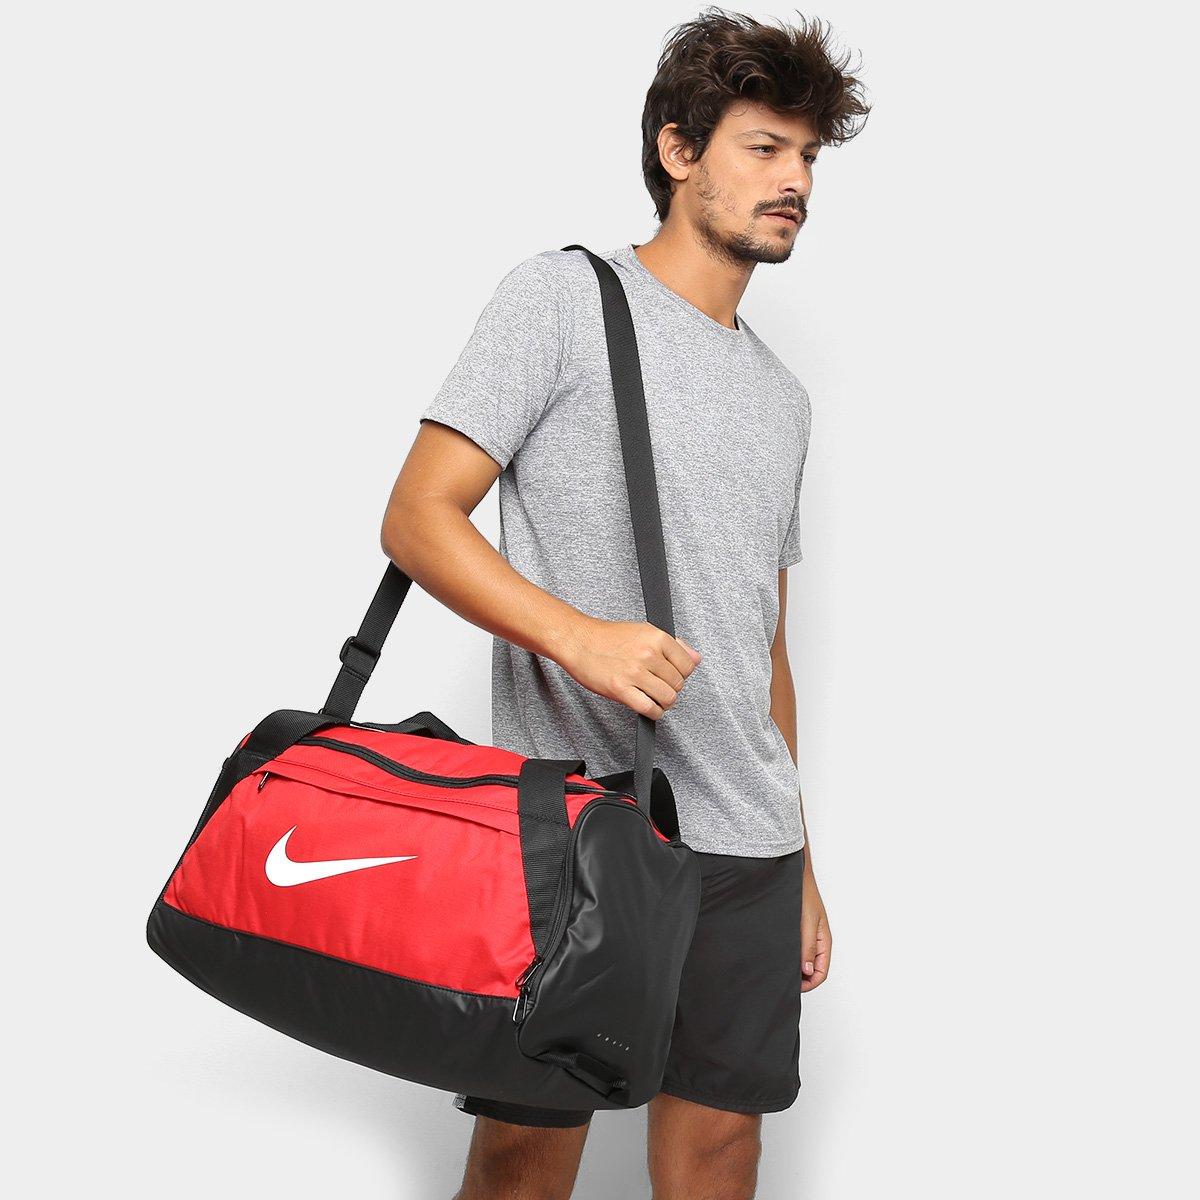 4f4d2ee76 Mala Nike de Treino Duffel Brasília - Shopping TudoAzul